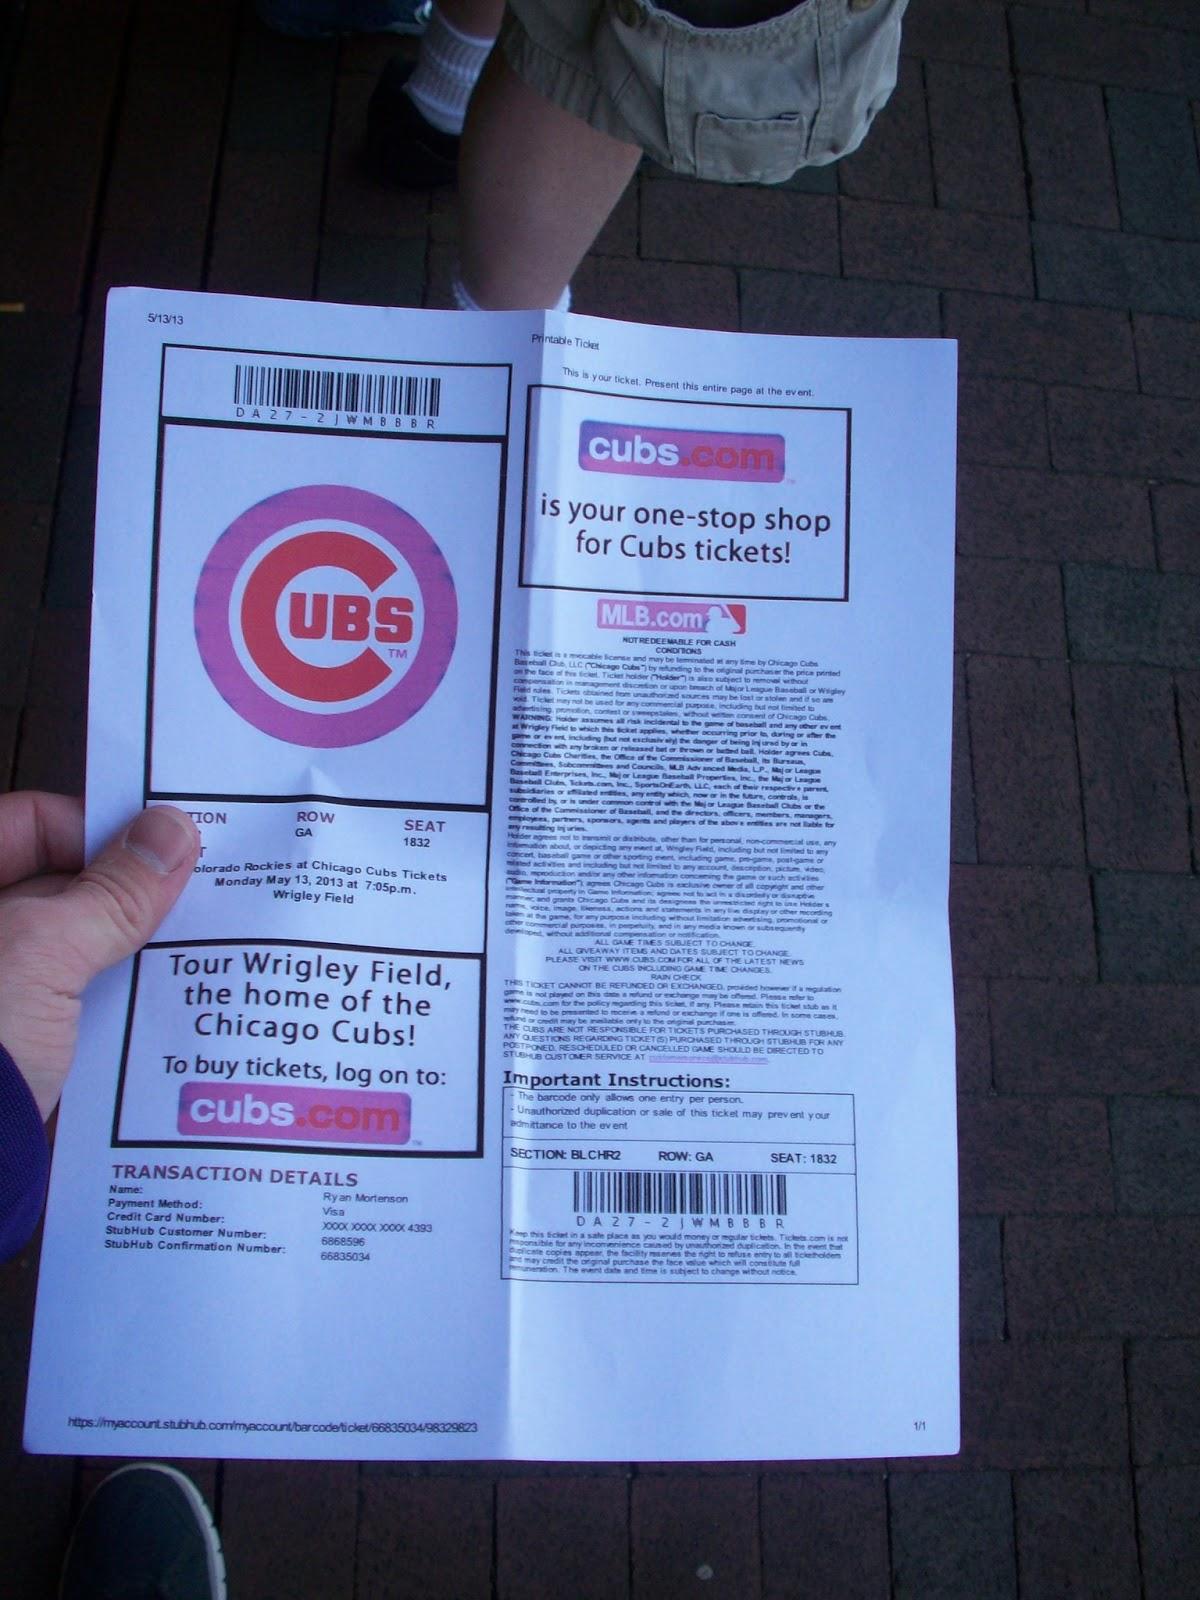 photo relating to Stubhub Printable Tickets named BaseBlog: Sport 3 - 5/13 at Wrigley Business